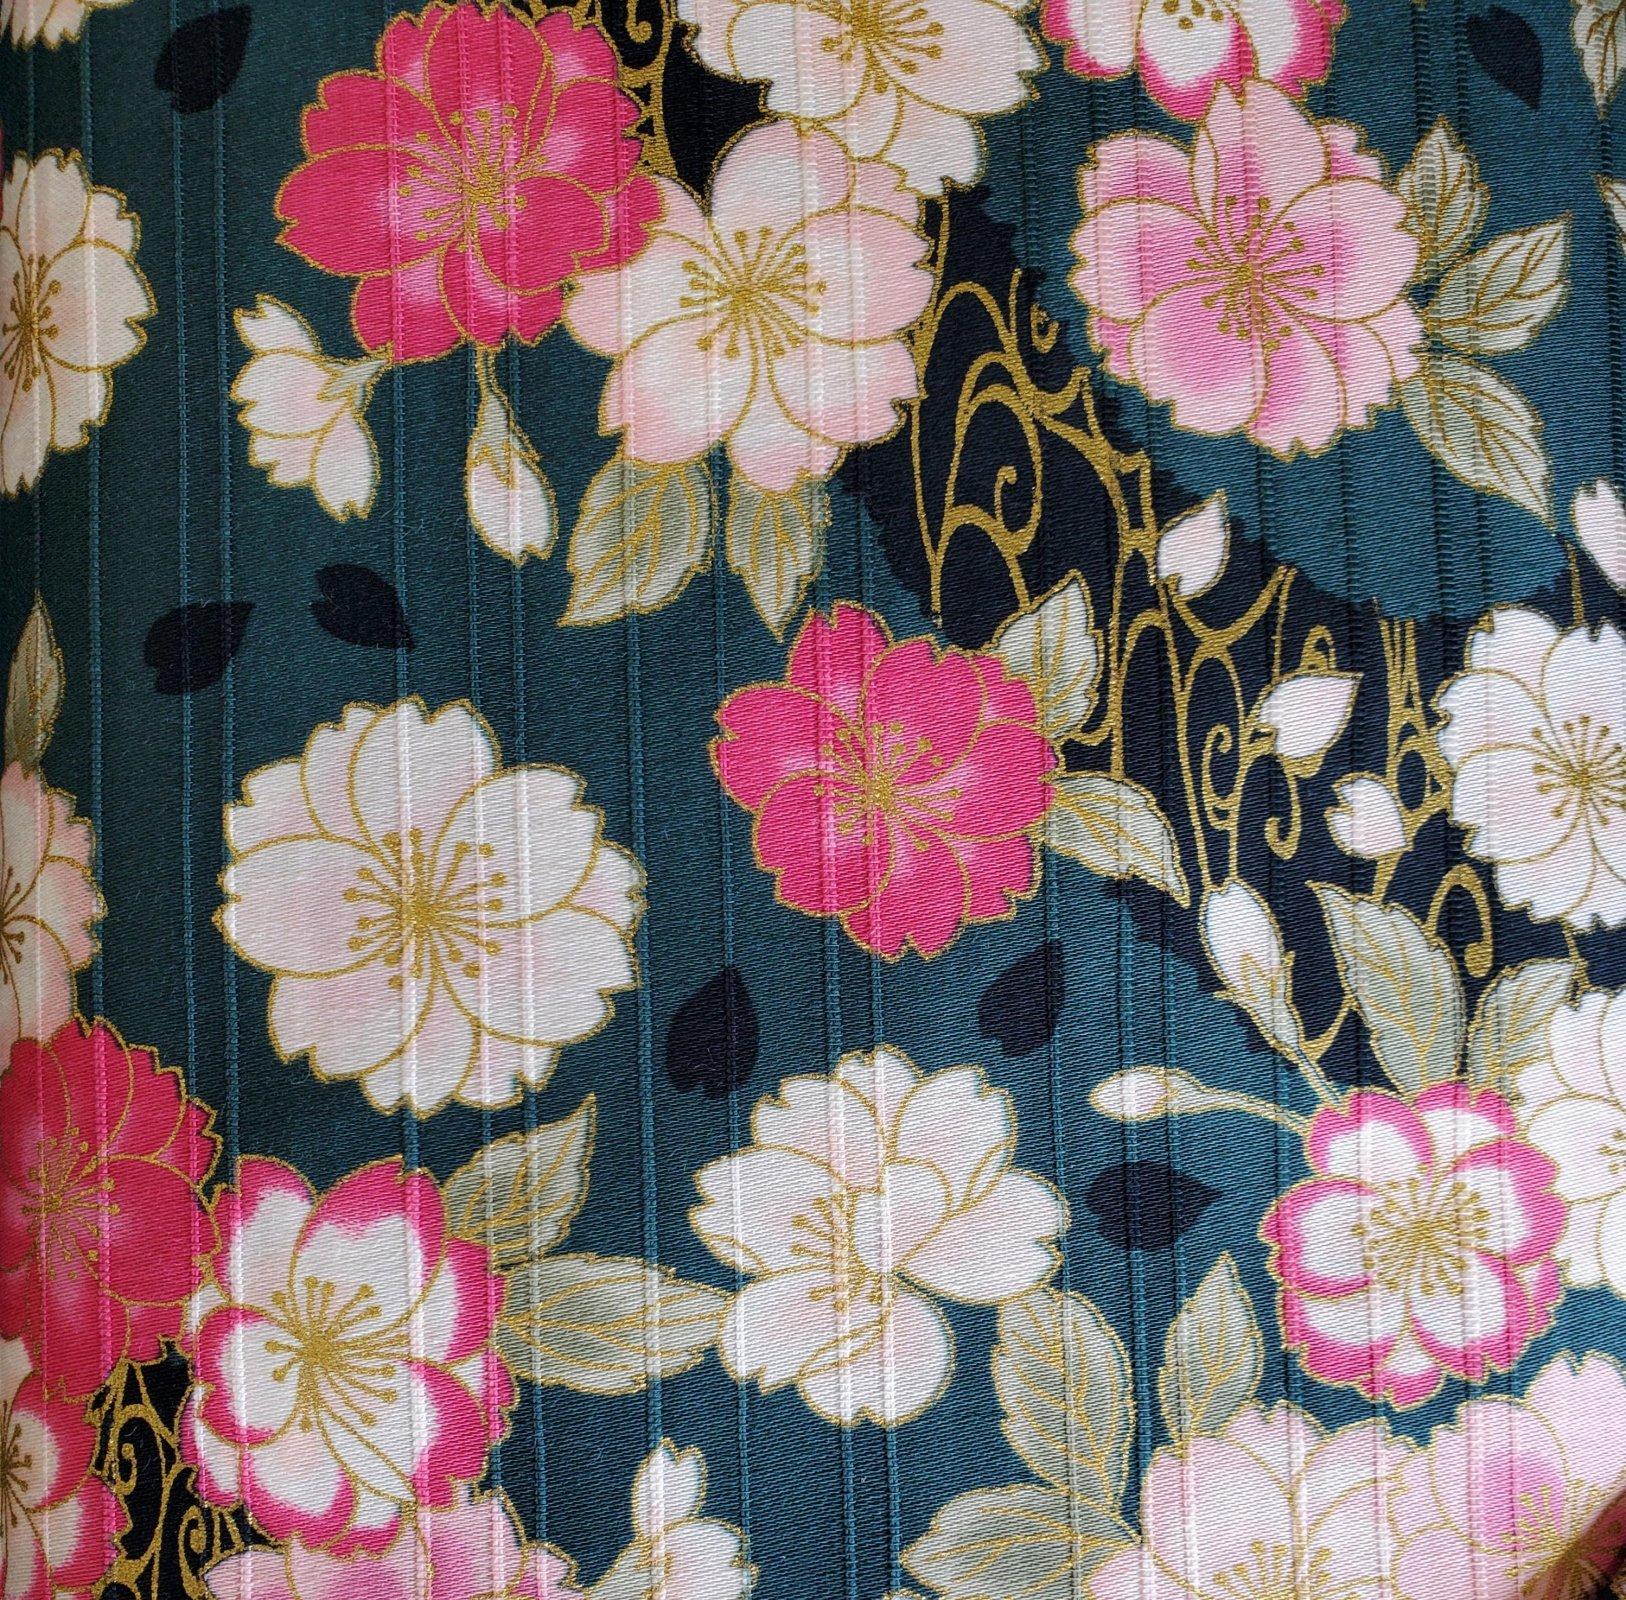 Japanese Spring - Pink Flowers on Teal